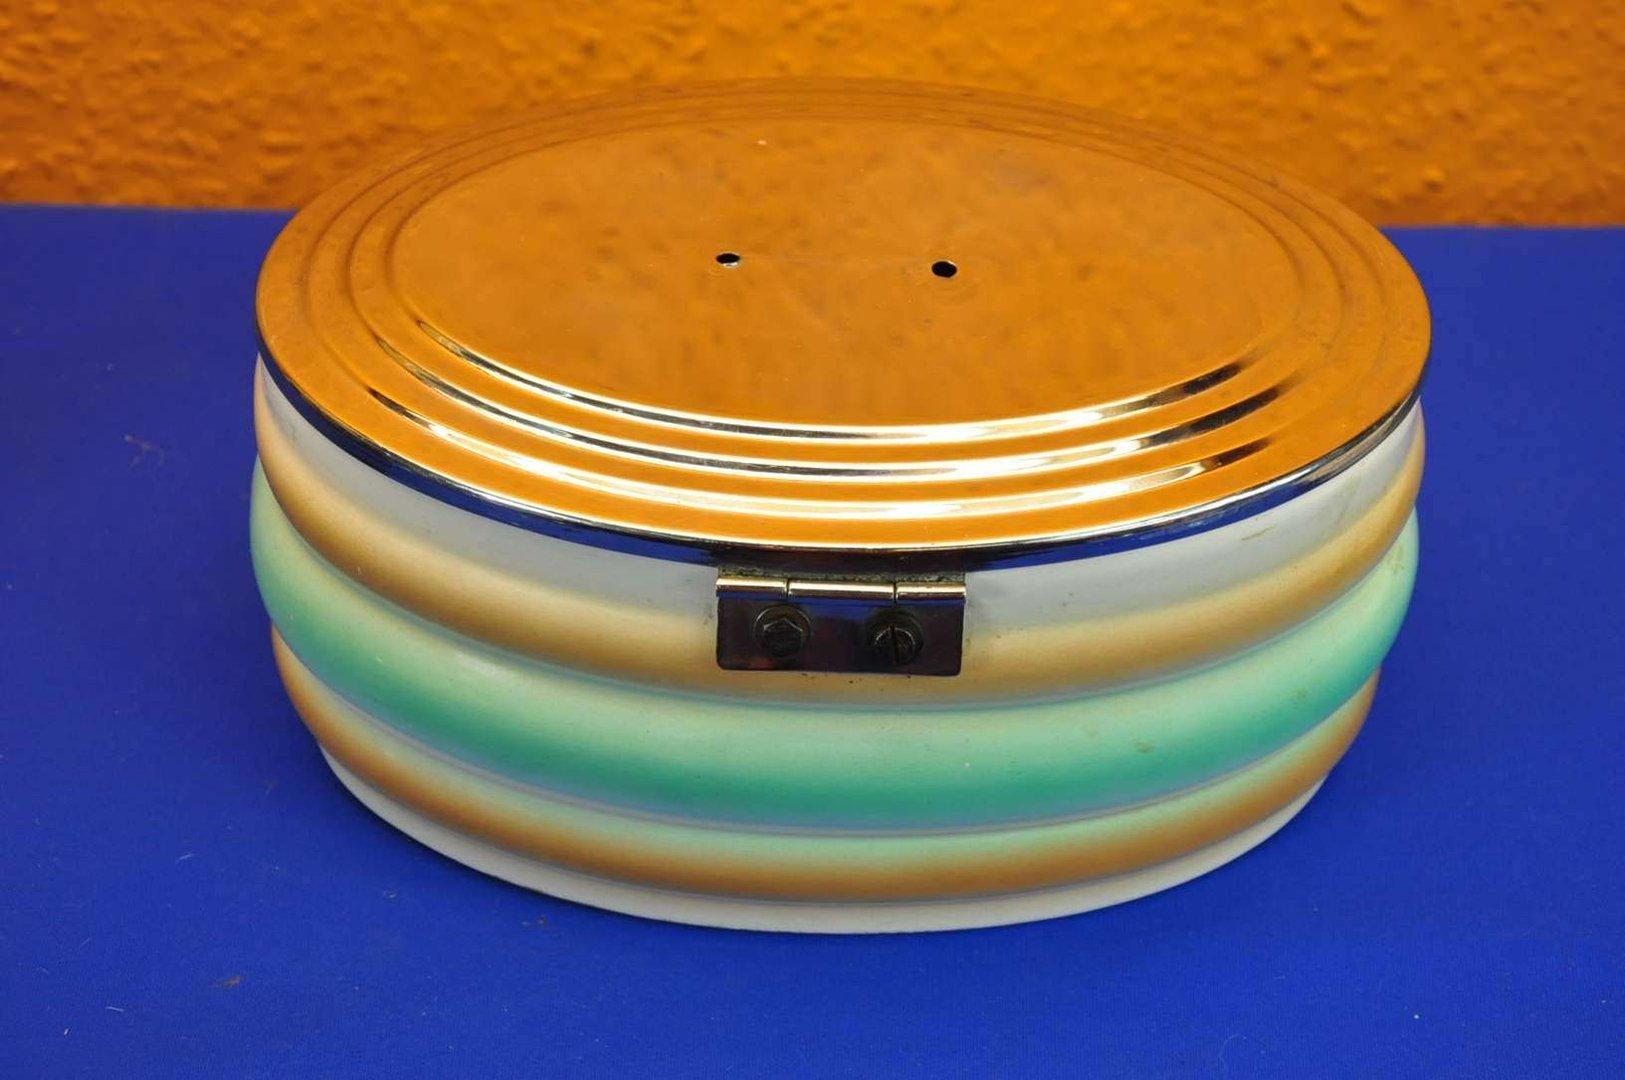 Bauhaus Buchholz lid box with spray decor bauhaus 30s pottery at shop kusera